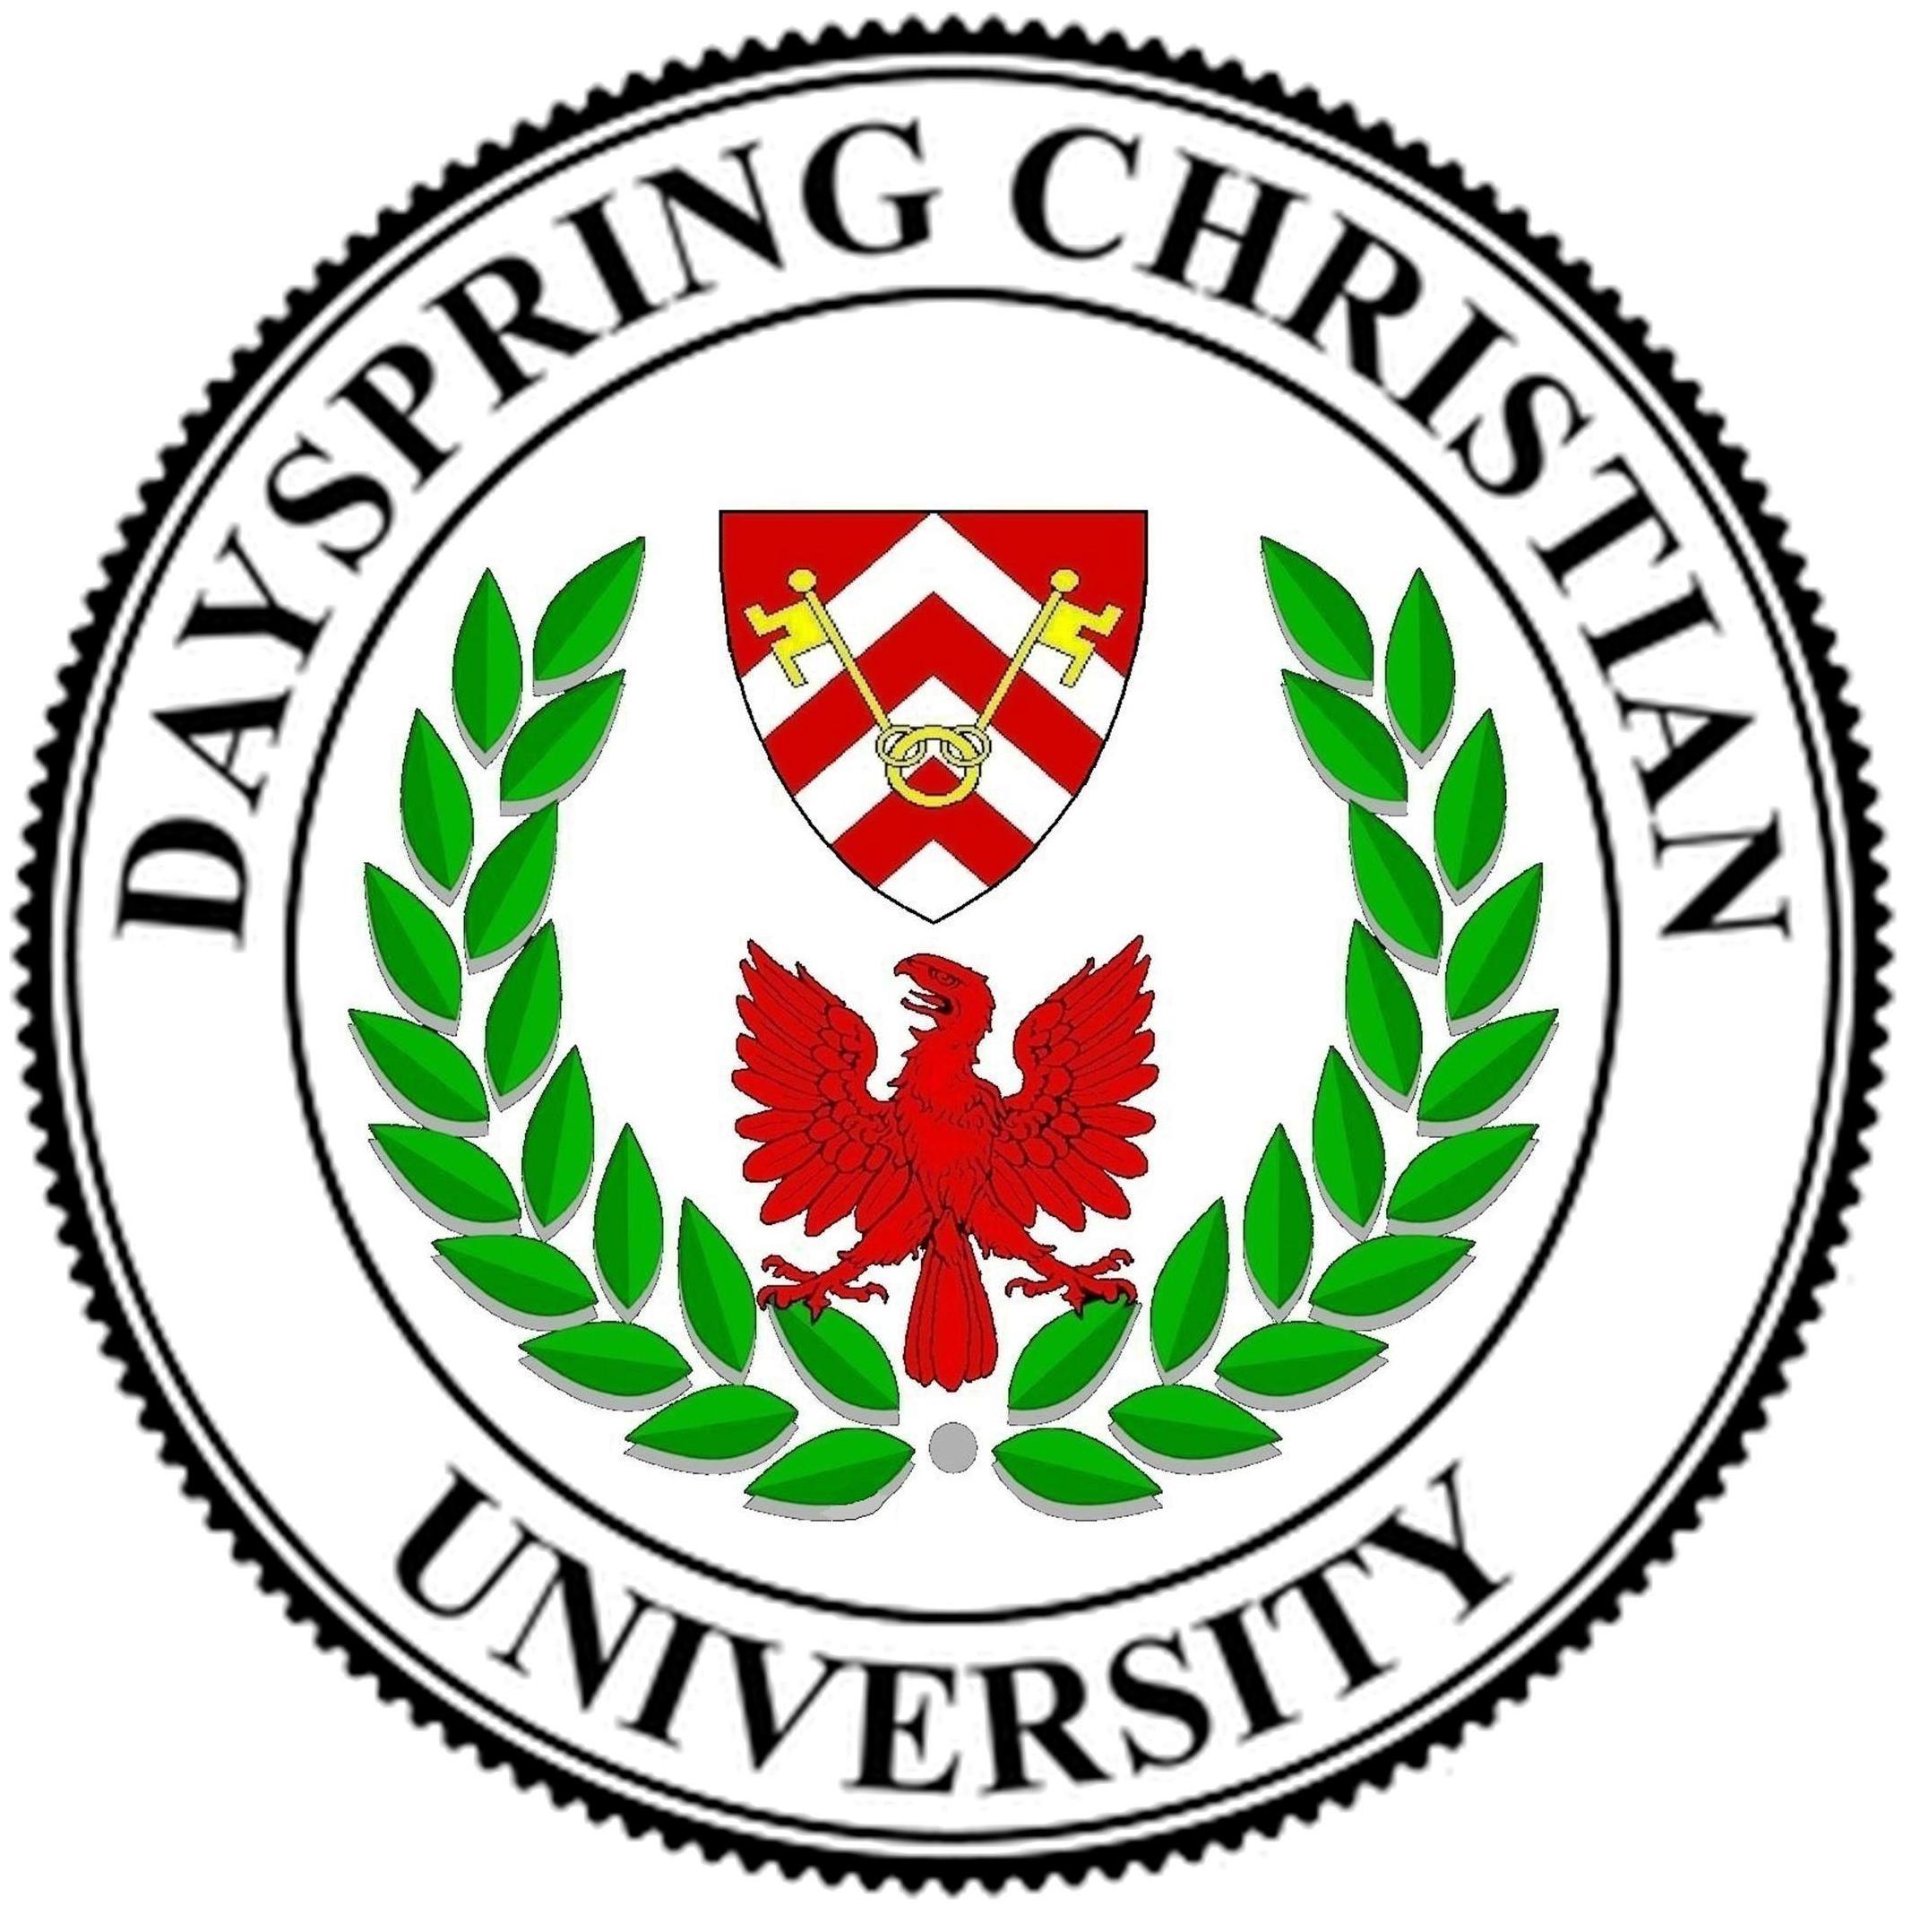 Christian Counseling international relations sydney university